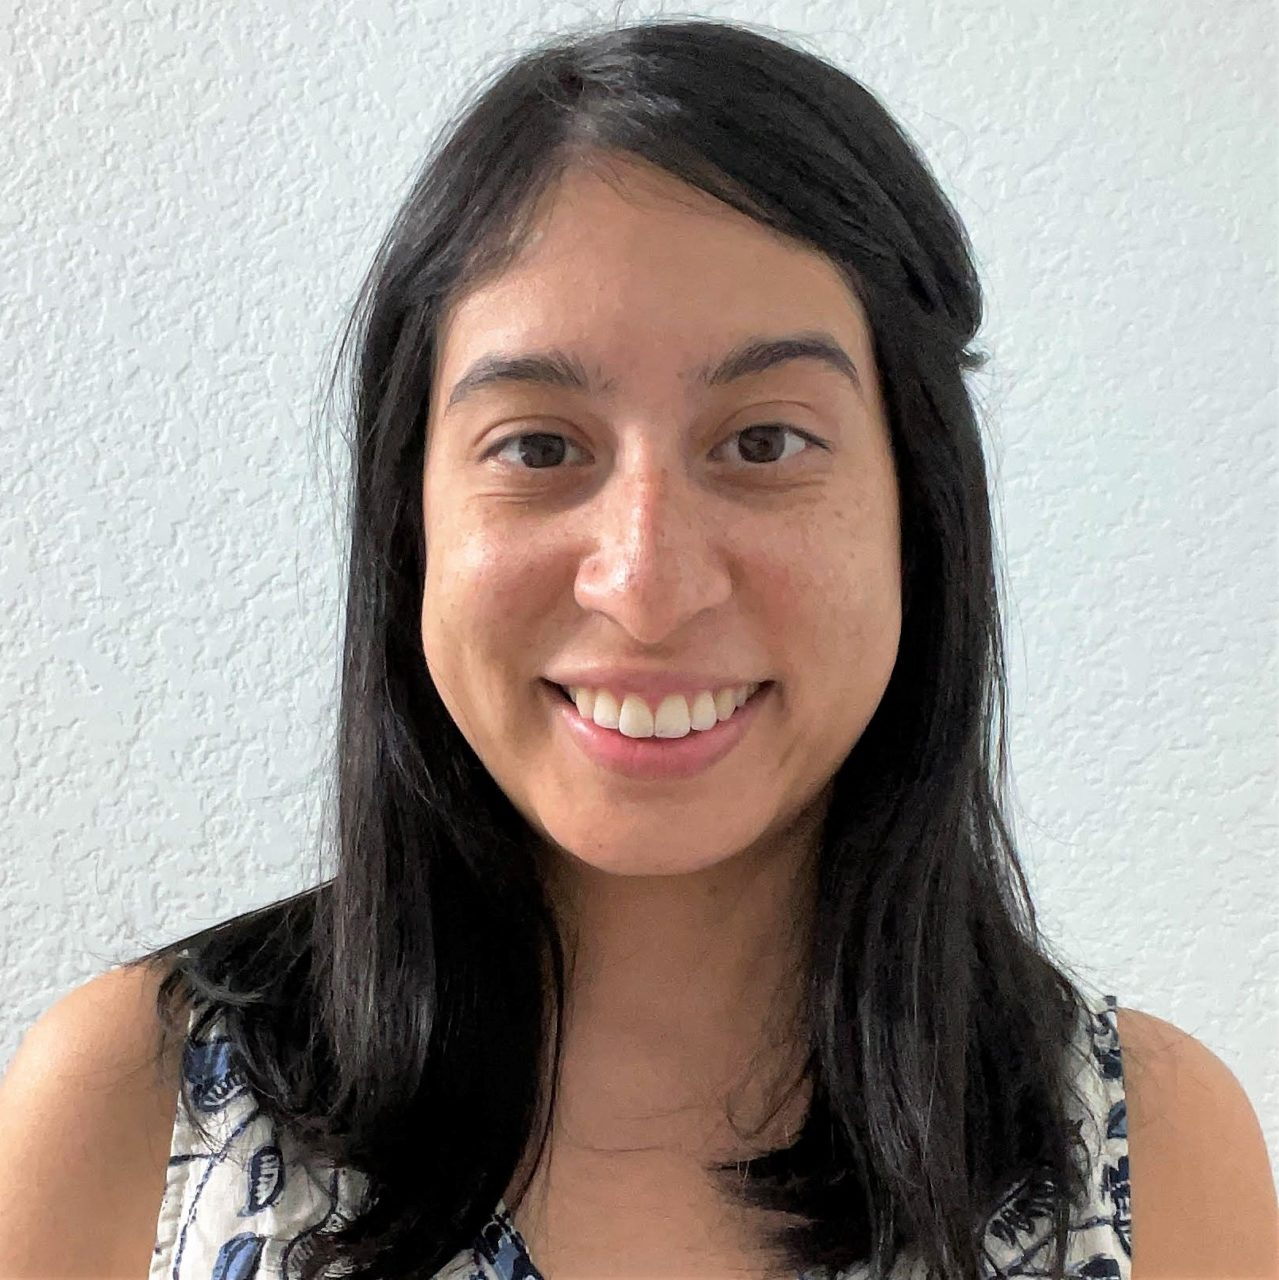 Photo of Erica Medina, PsyD Student